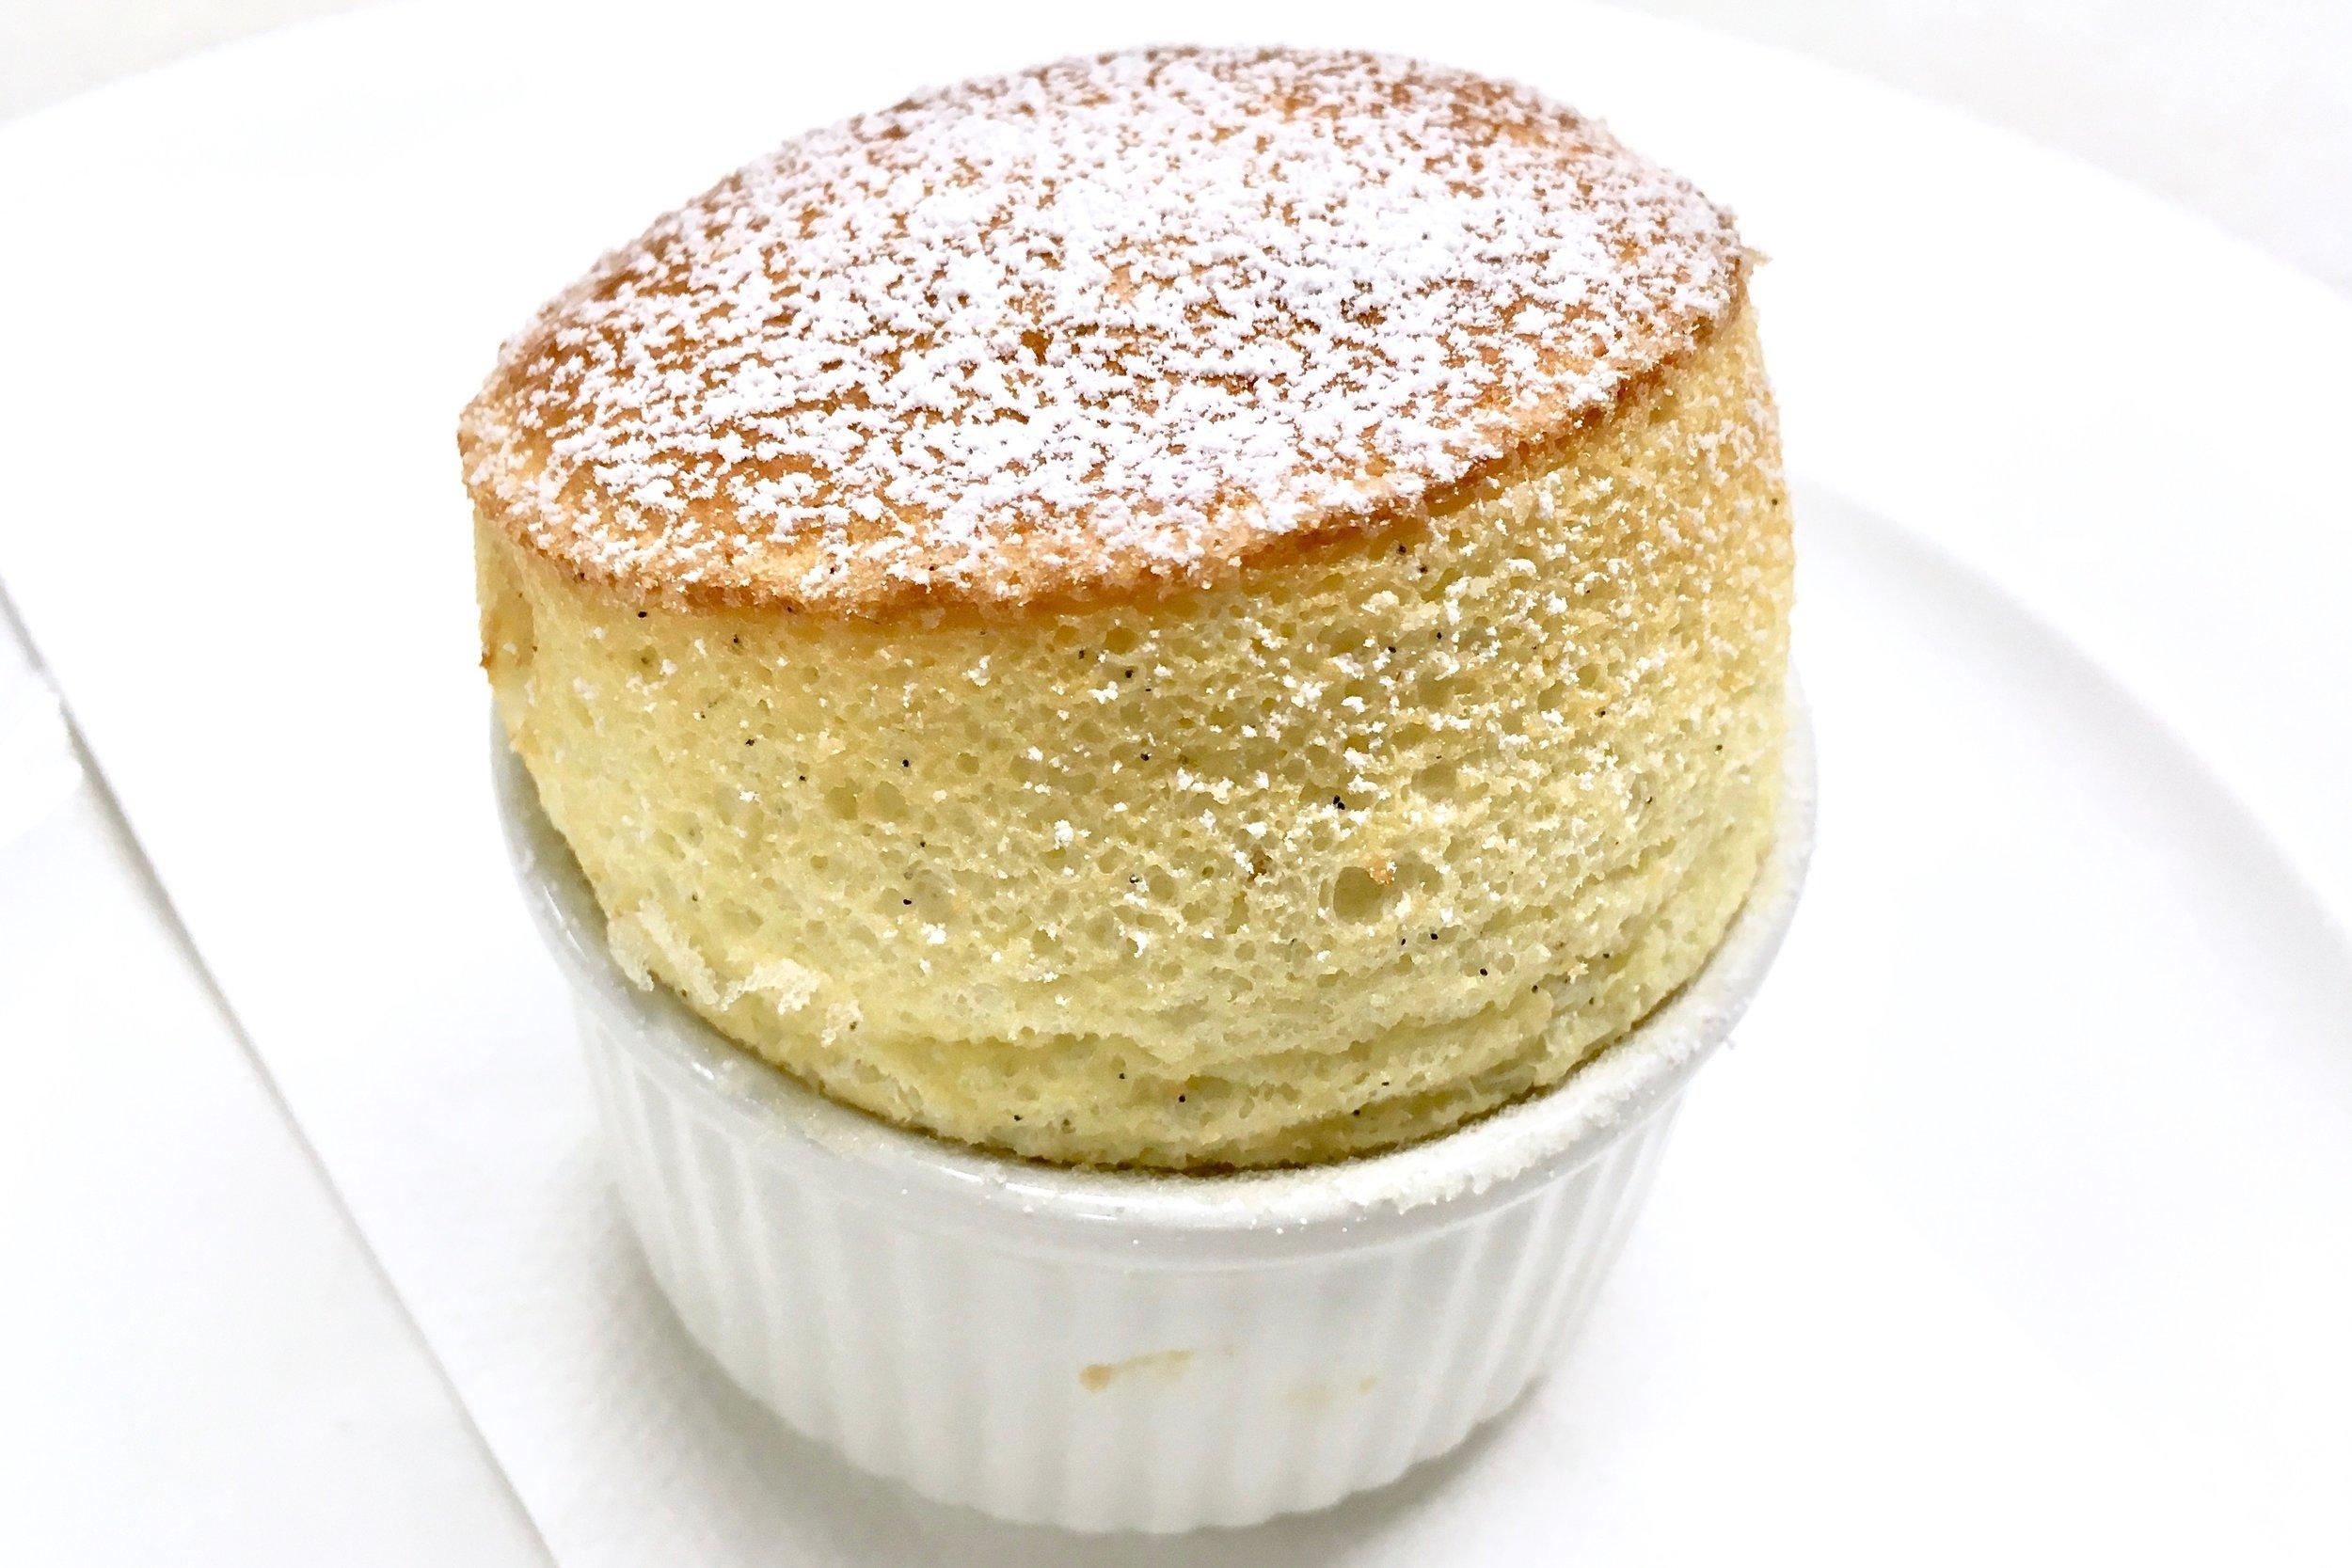 Hot vanilla soufflé